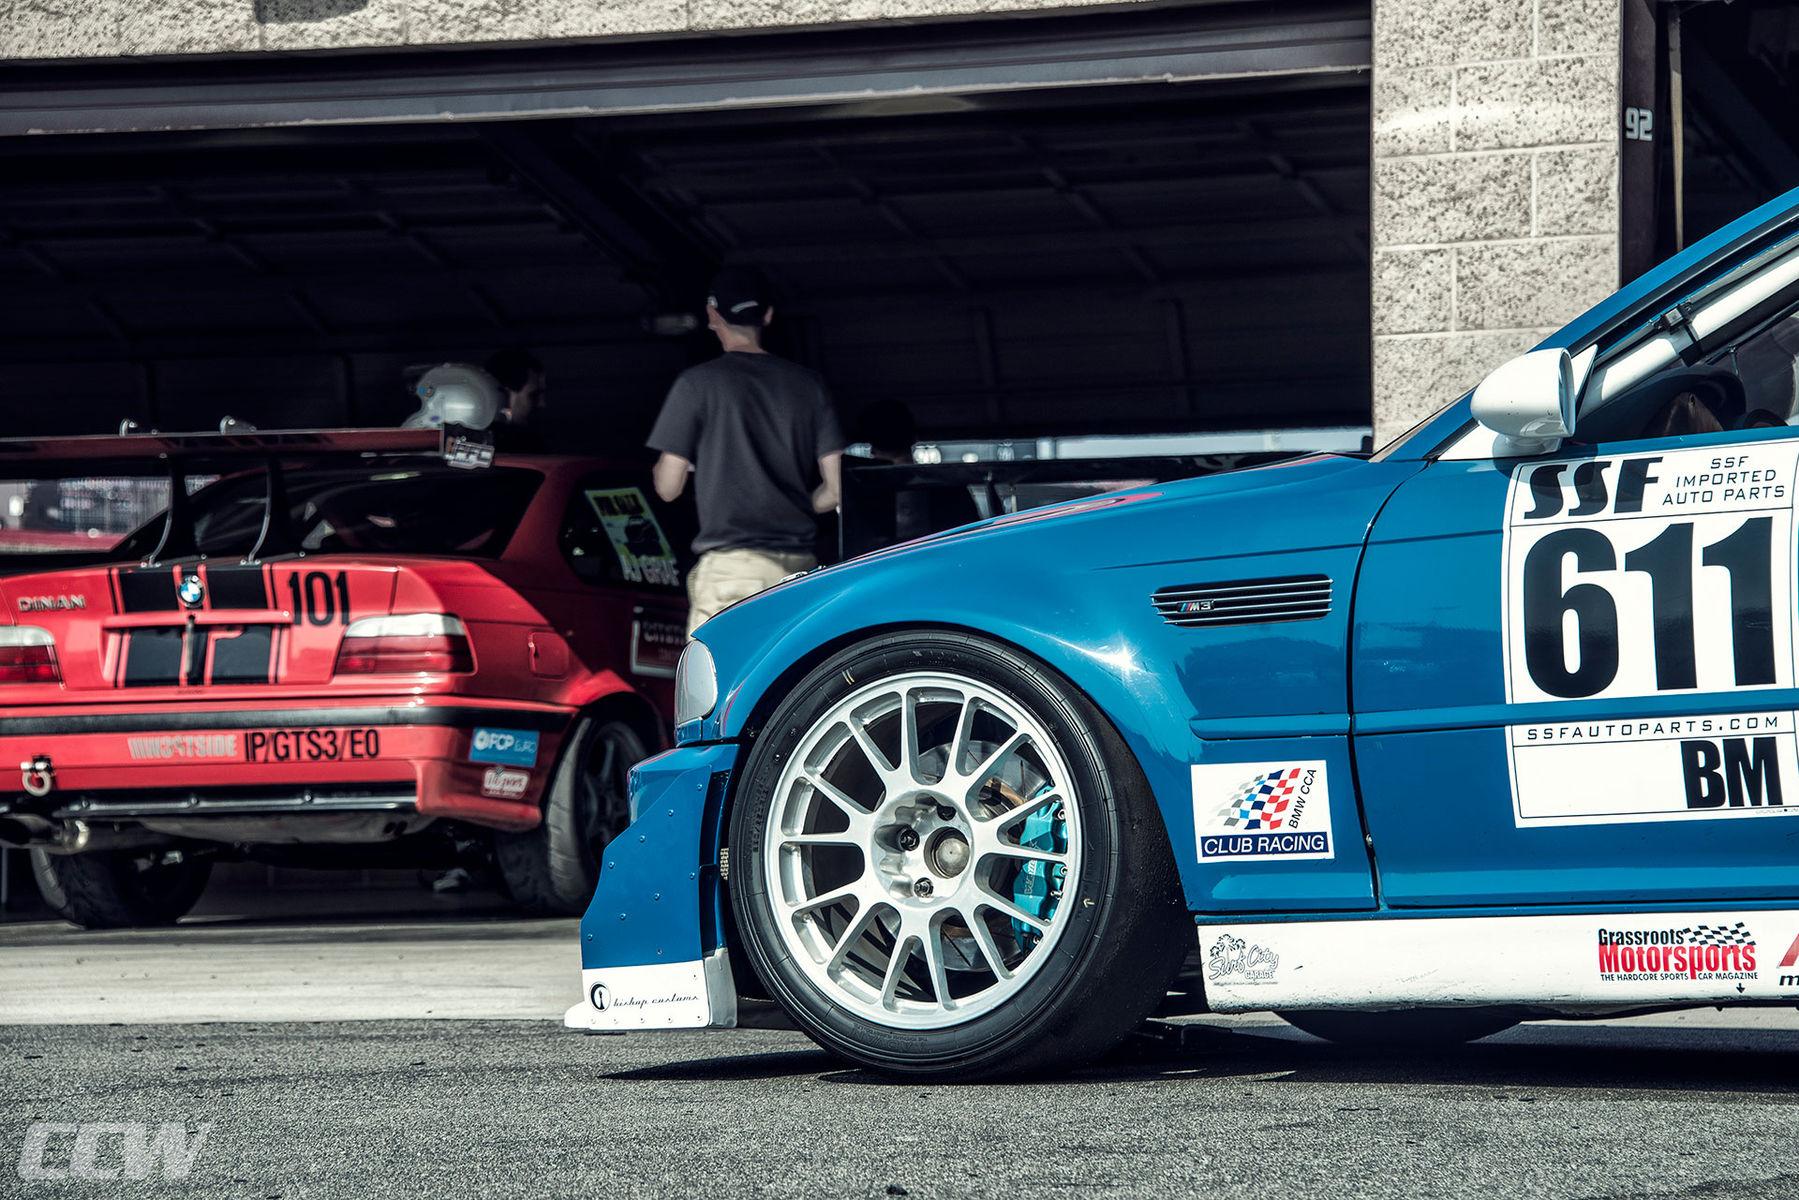 BMW M3 | BMW E46 Race Car - CCW C14 Forged Lightweight Monoblock Wheels